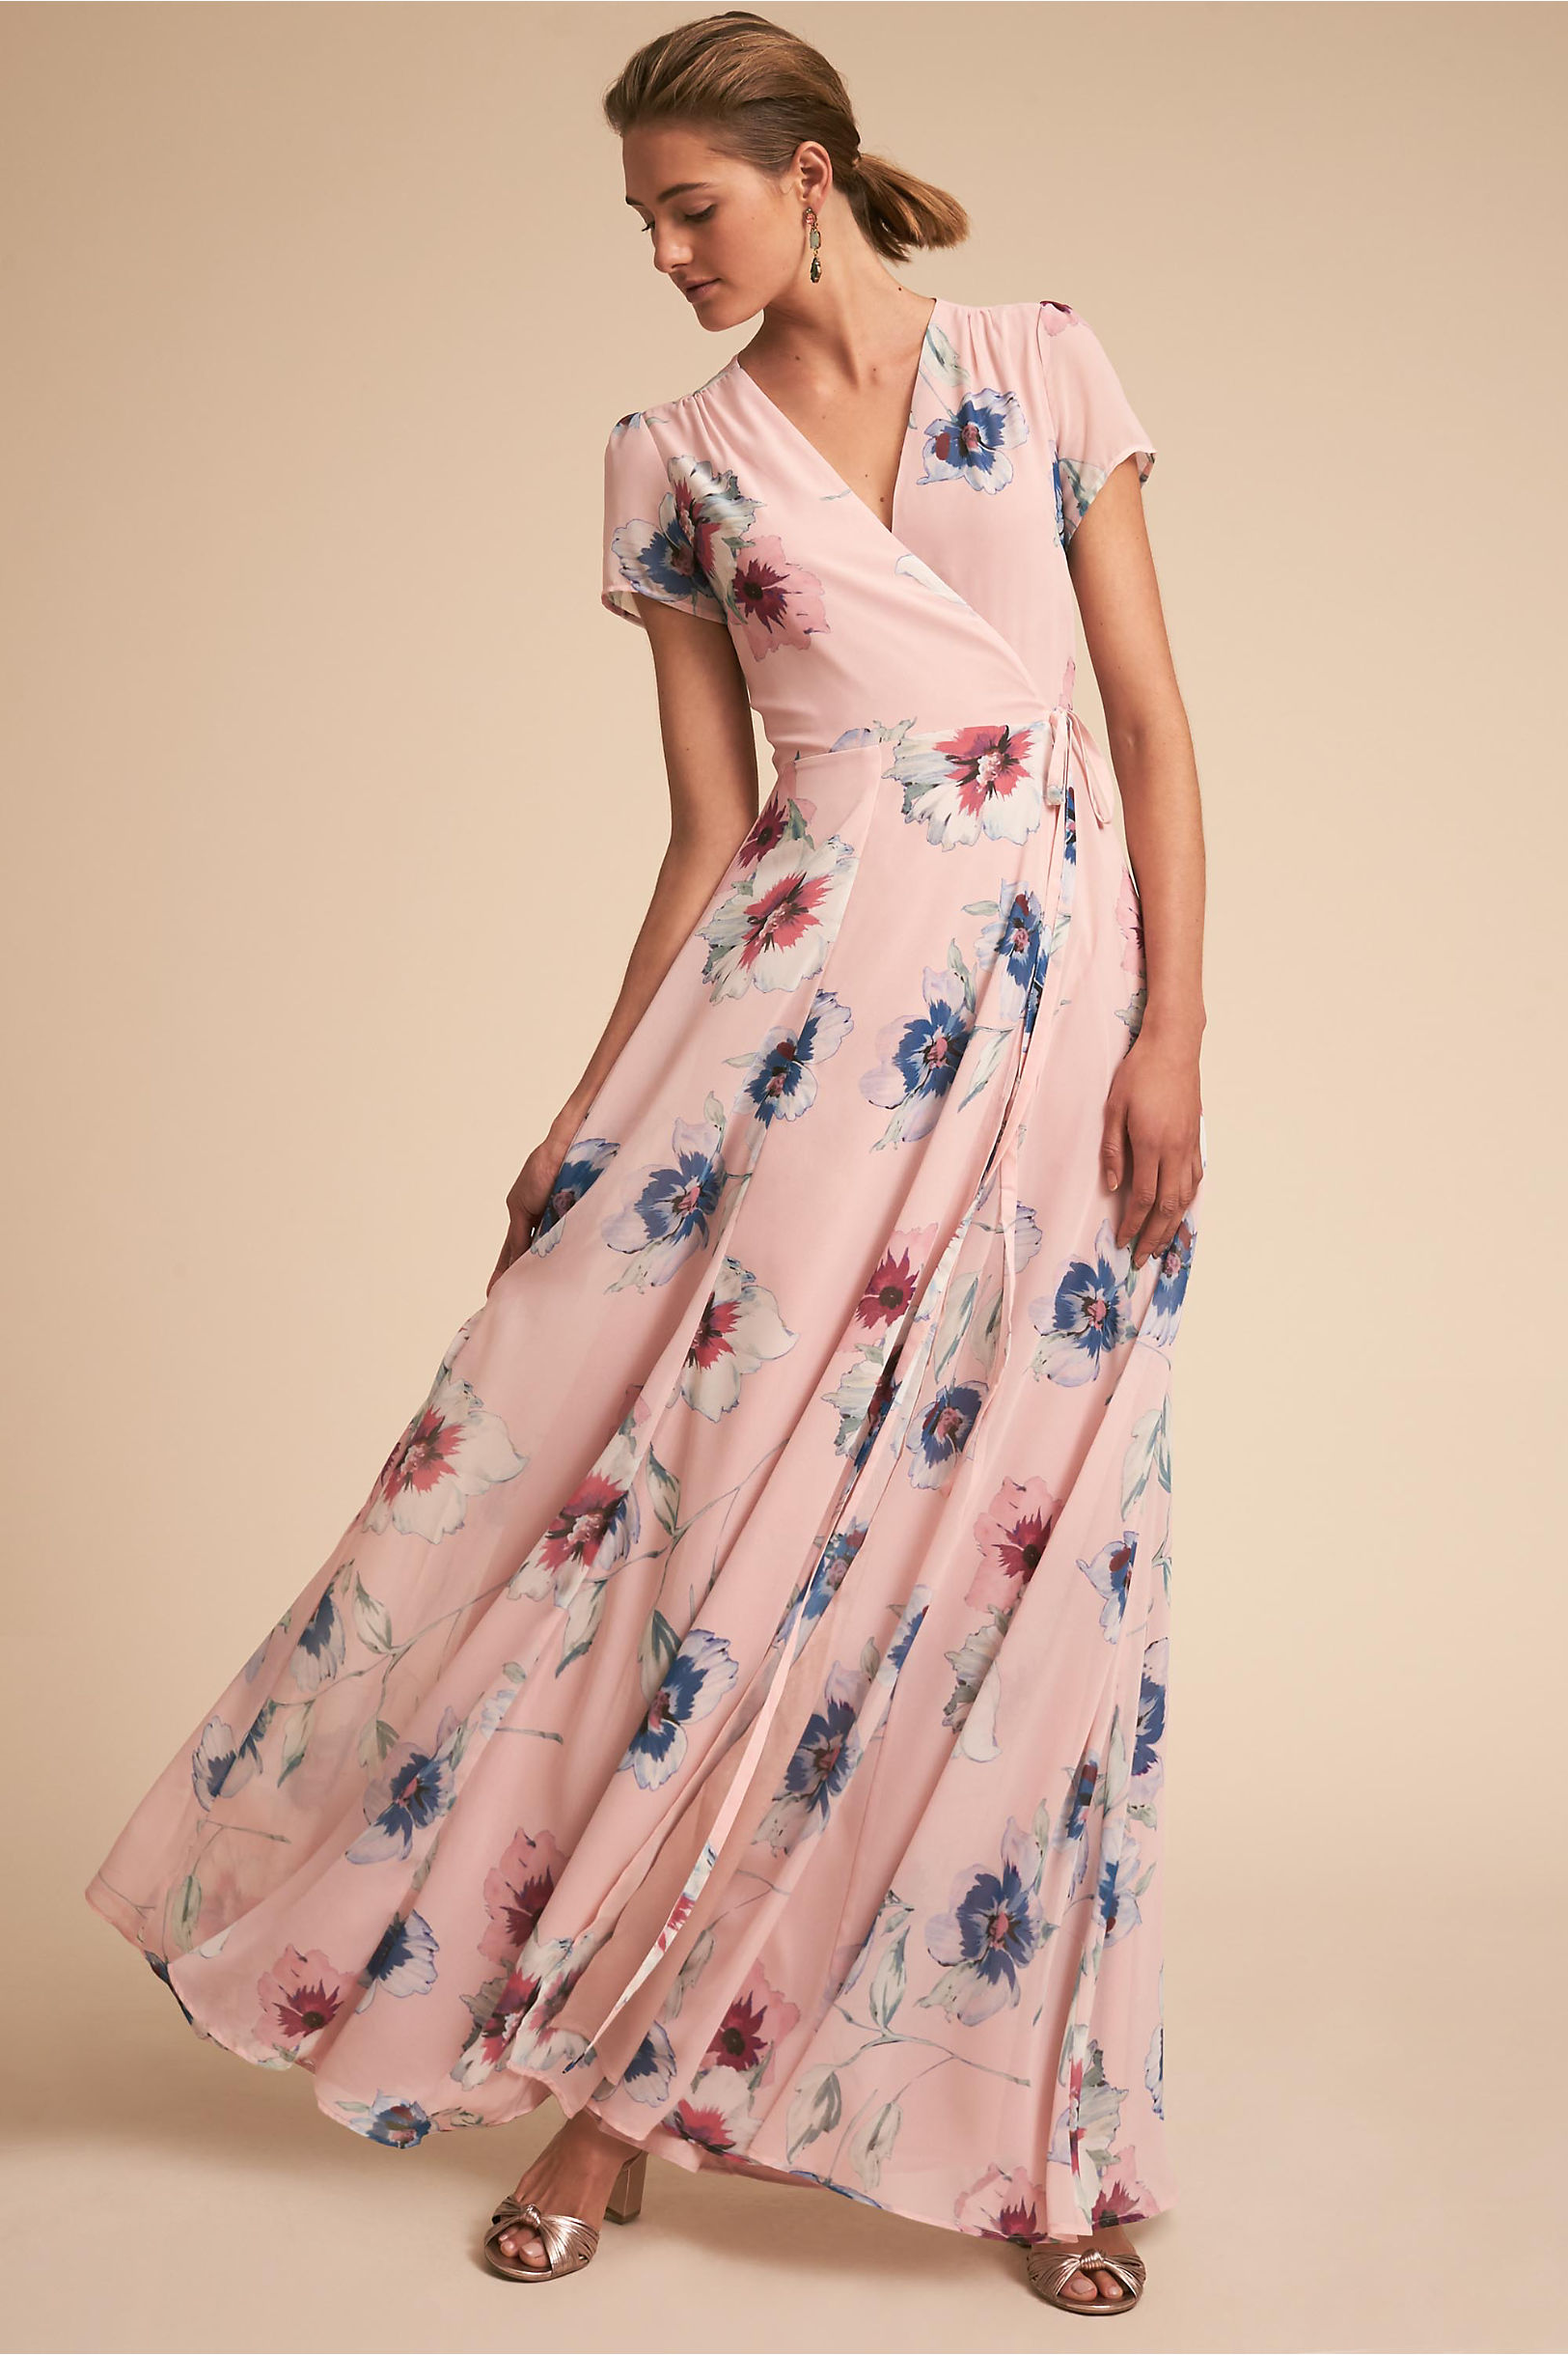 Calypso Dress in Sale | BHLDN